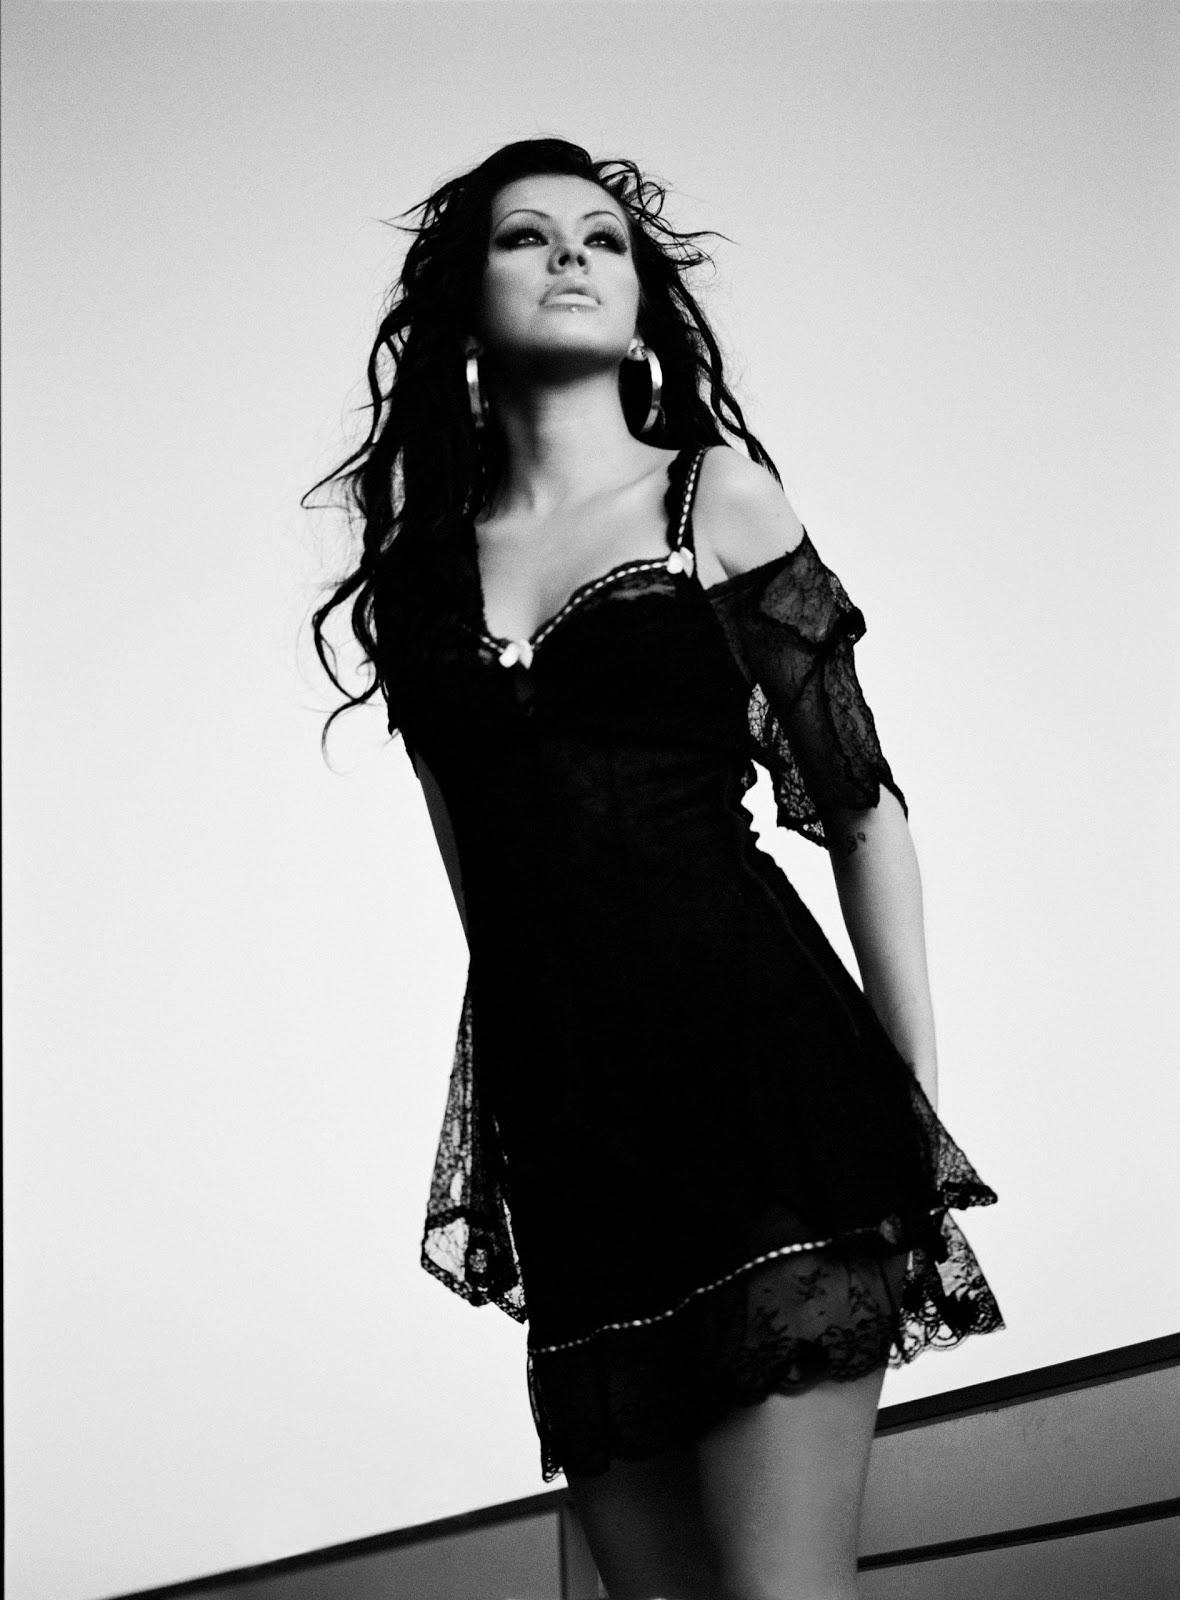 http://1.bp.blogspot.com/-cSyiDkEgg7M/UGKEJEDL2cI/AAAAAAAADjc/ym4Za0UzUyM/s1600/Christina+Aguilera+-+Stripped+Album+Promos+-+02.jpg